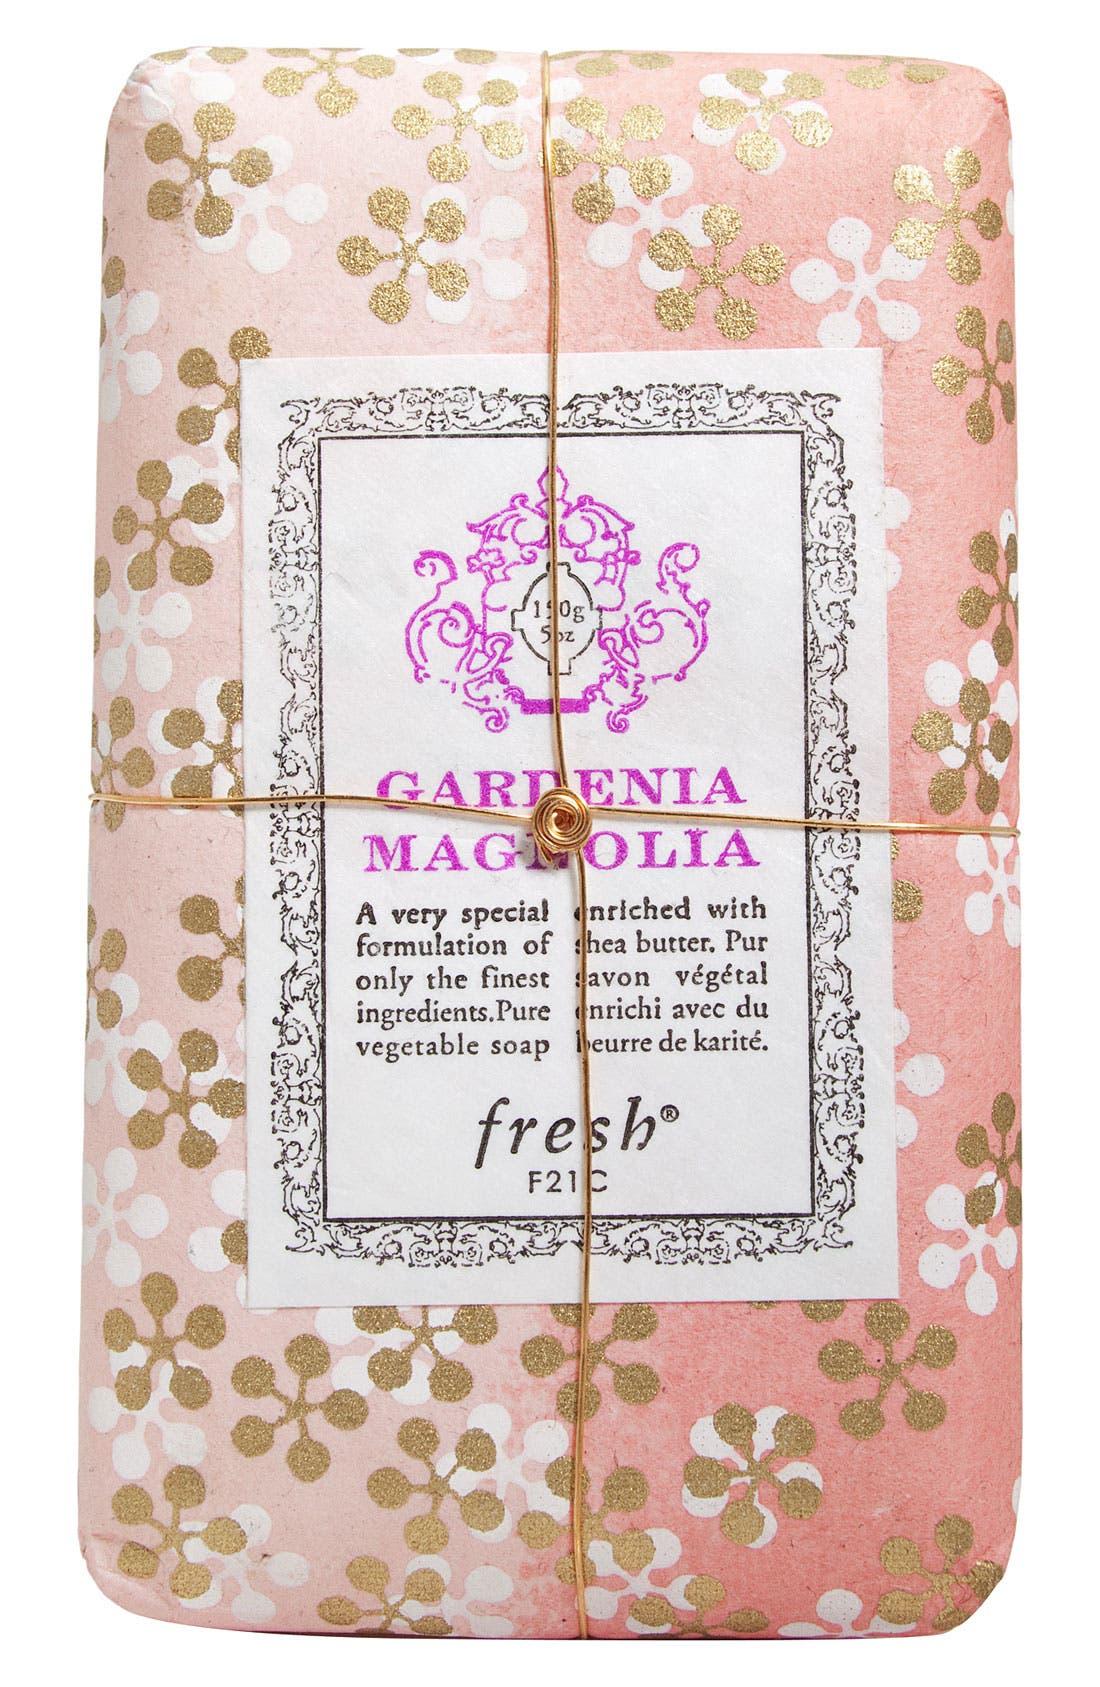 Fresh® Gardenia Magnolia Petit Soap